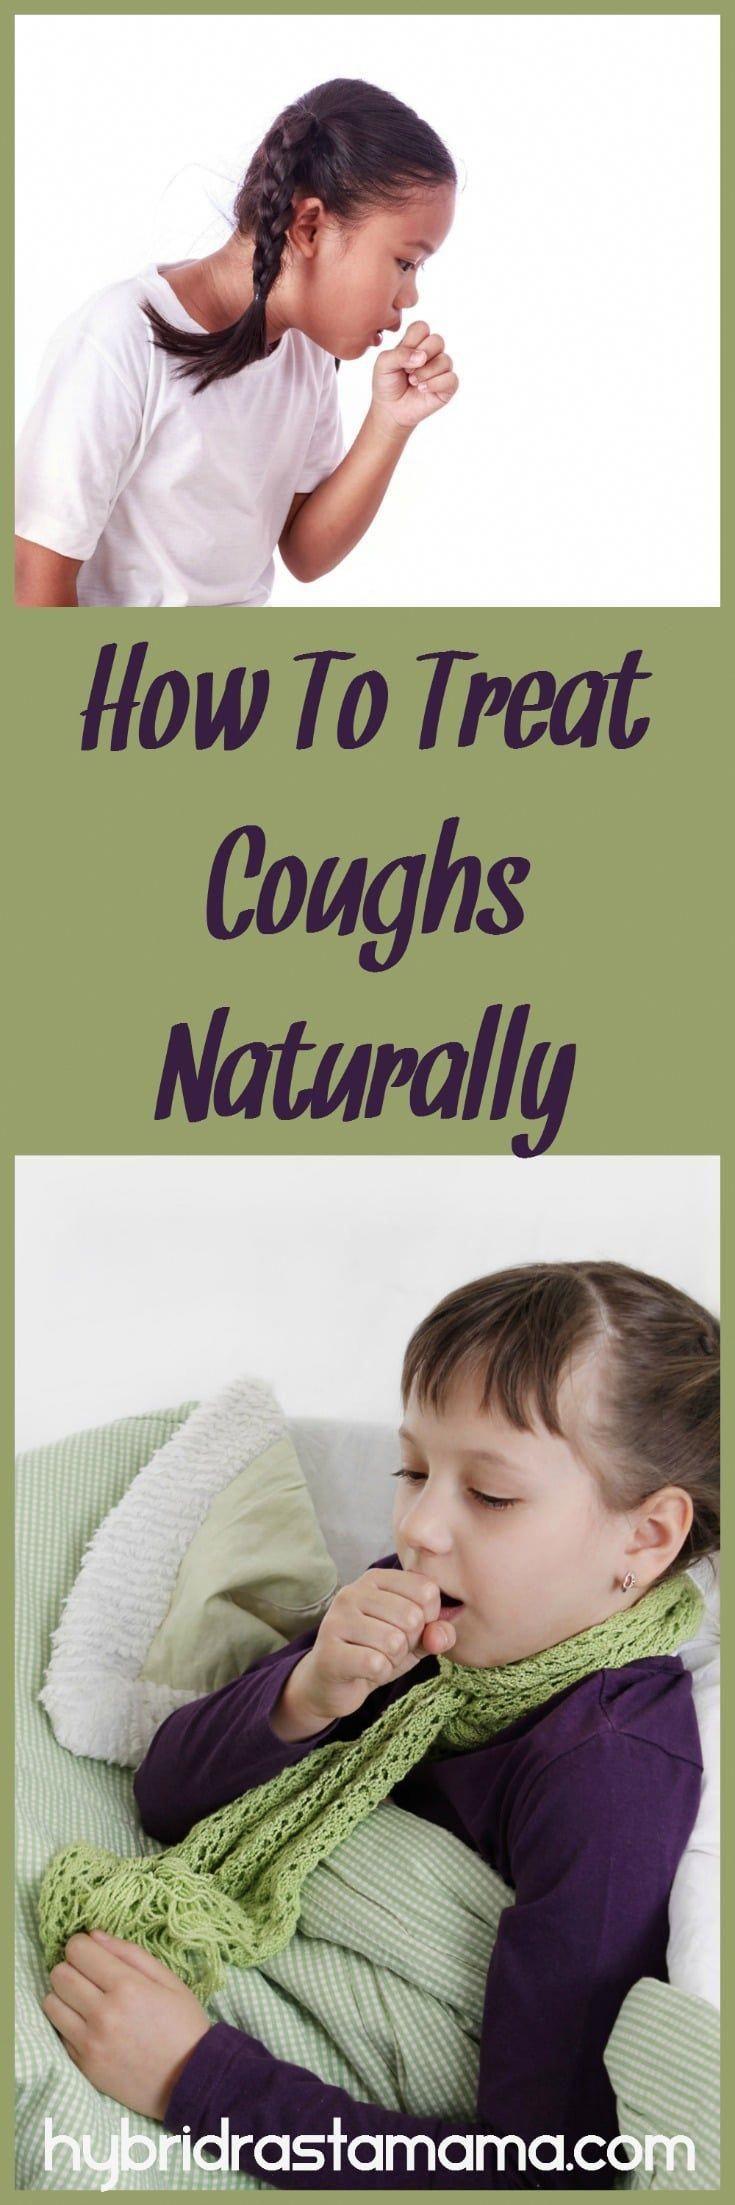 Pin on body odor tips